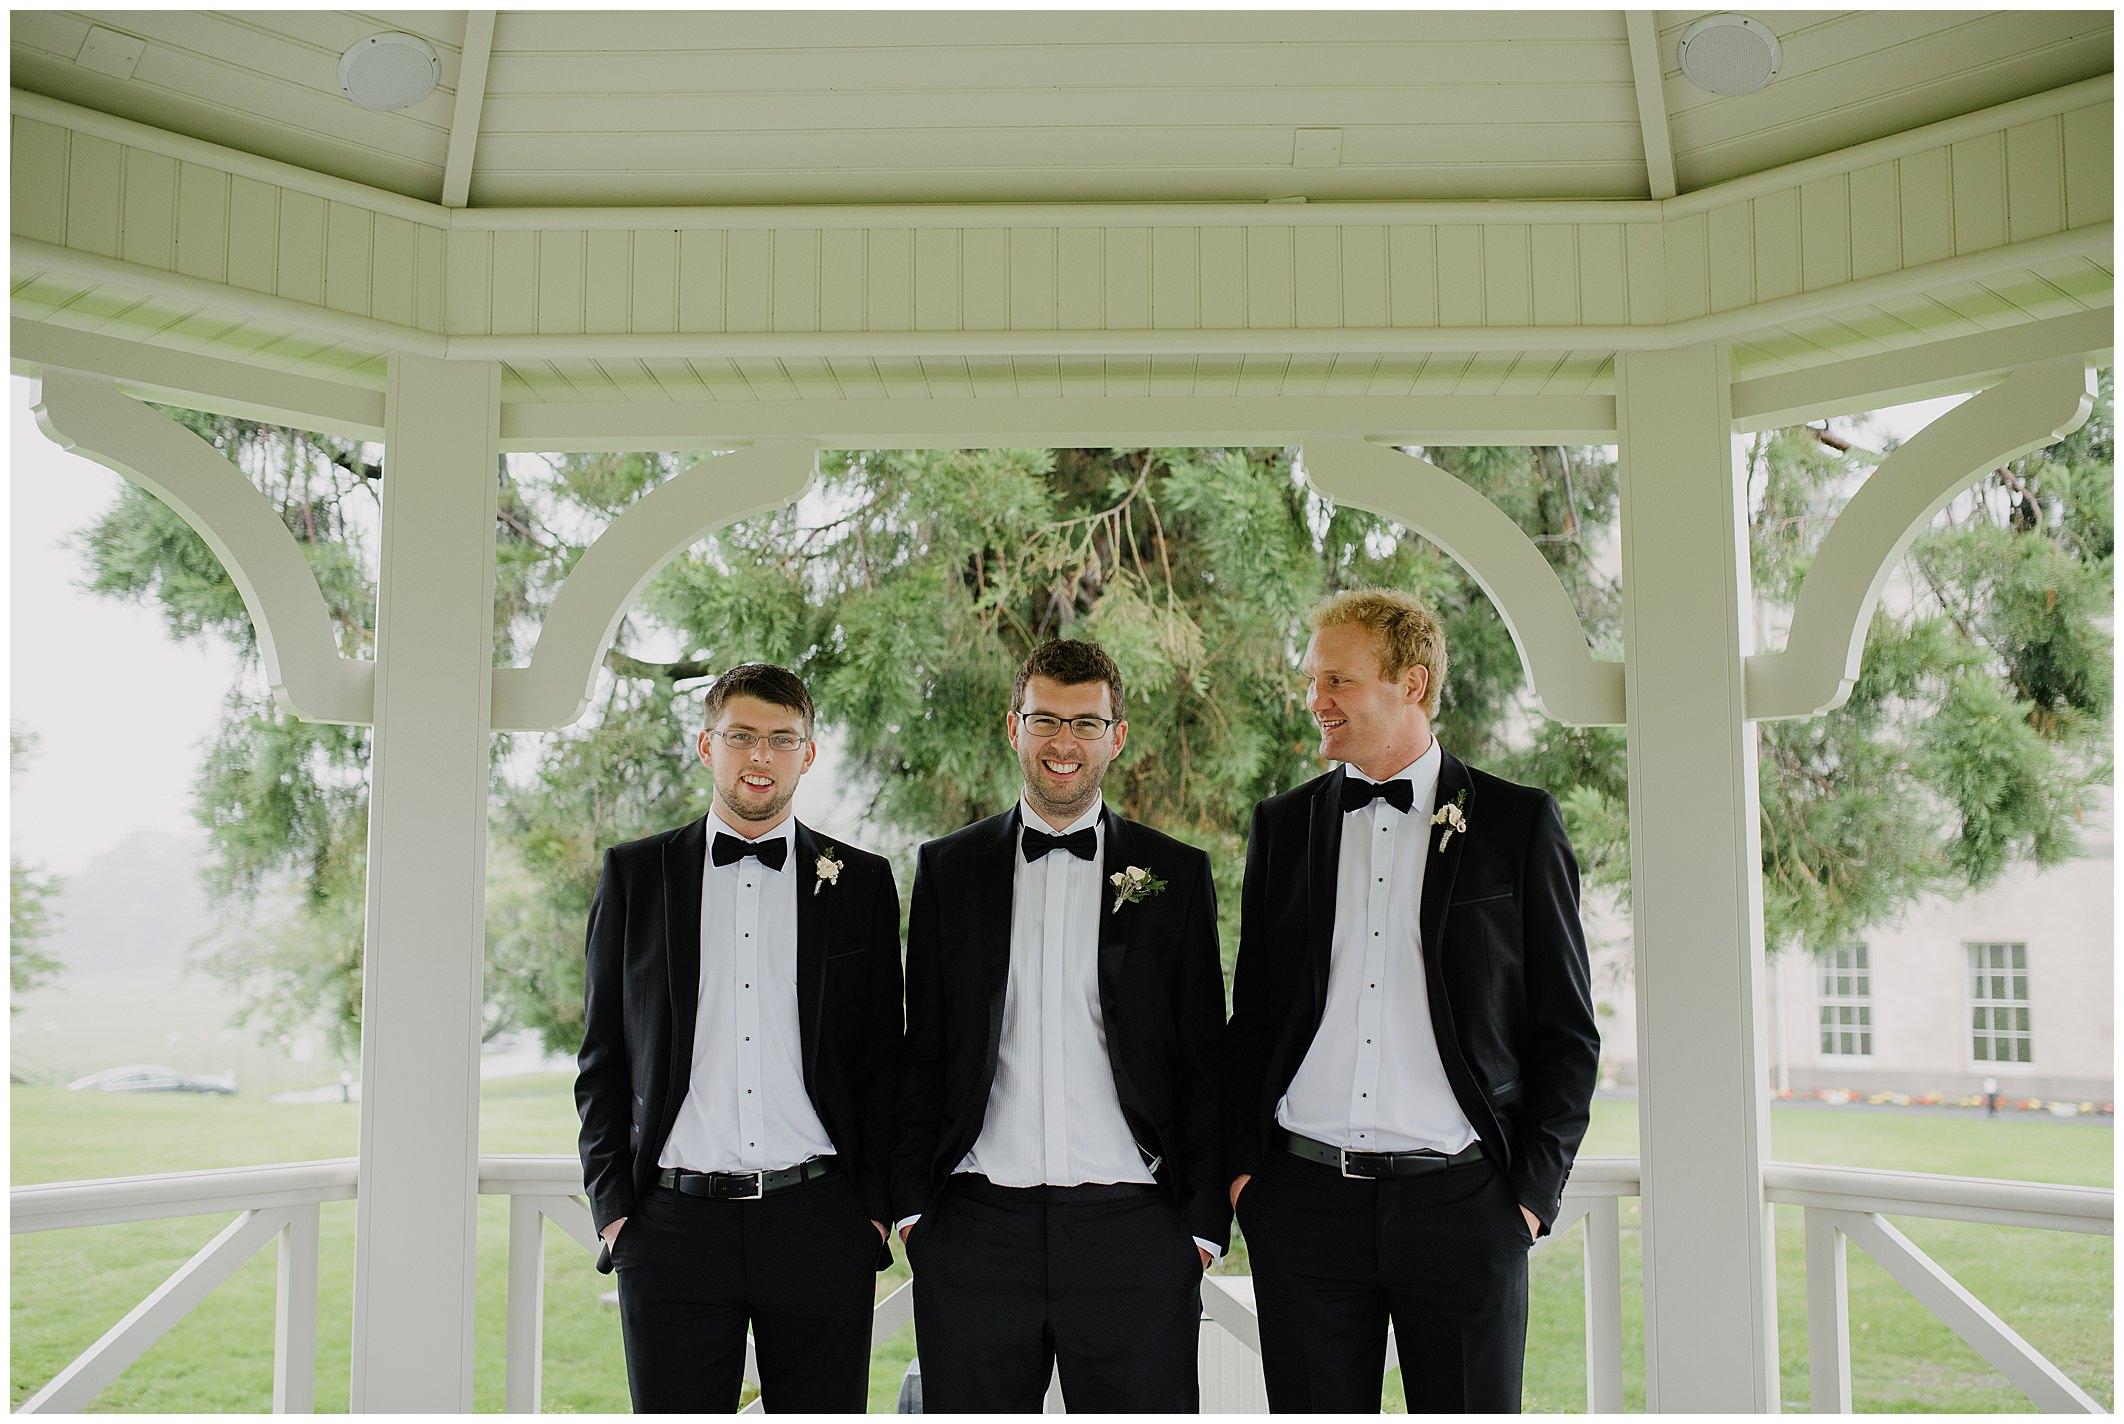 farnham-estate-wedding-jude-browne-photography_0124.jpg